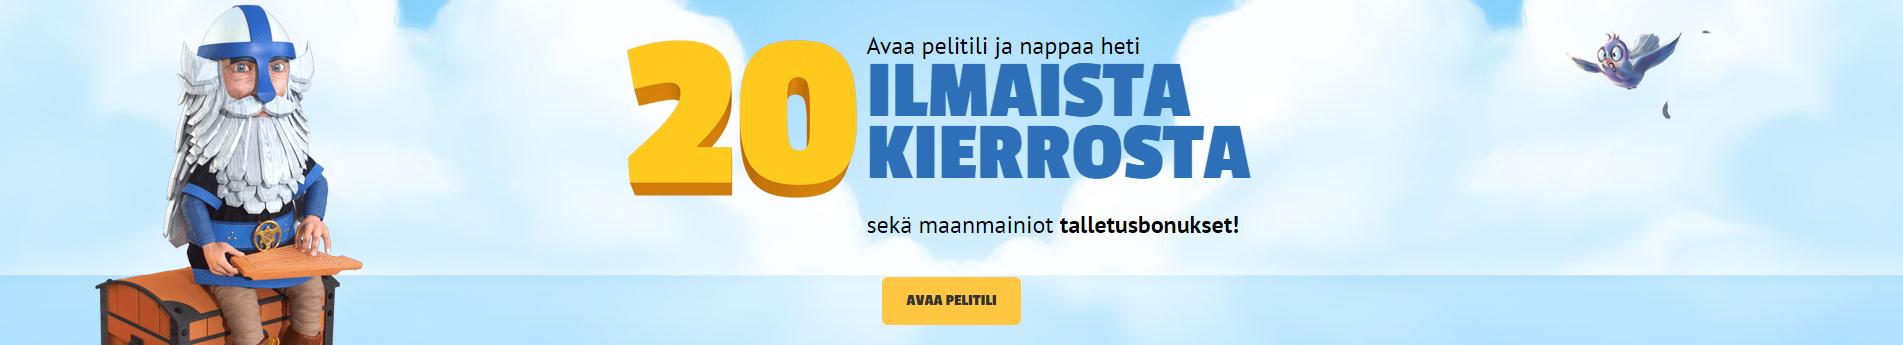 Kalevala-Casino-Finland-Images1